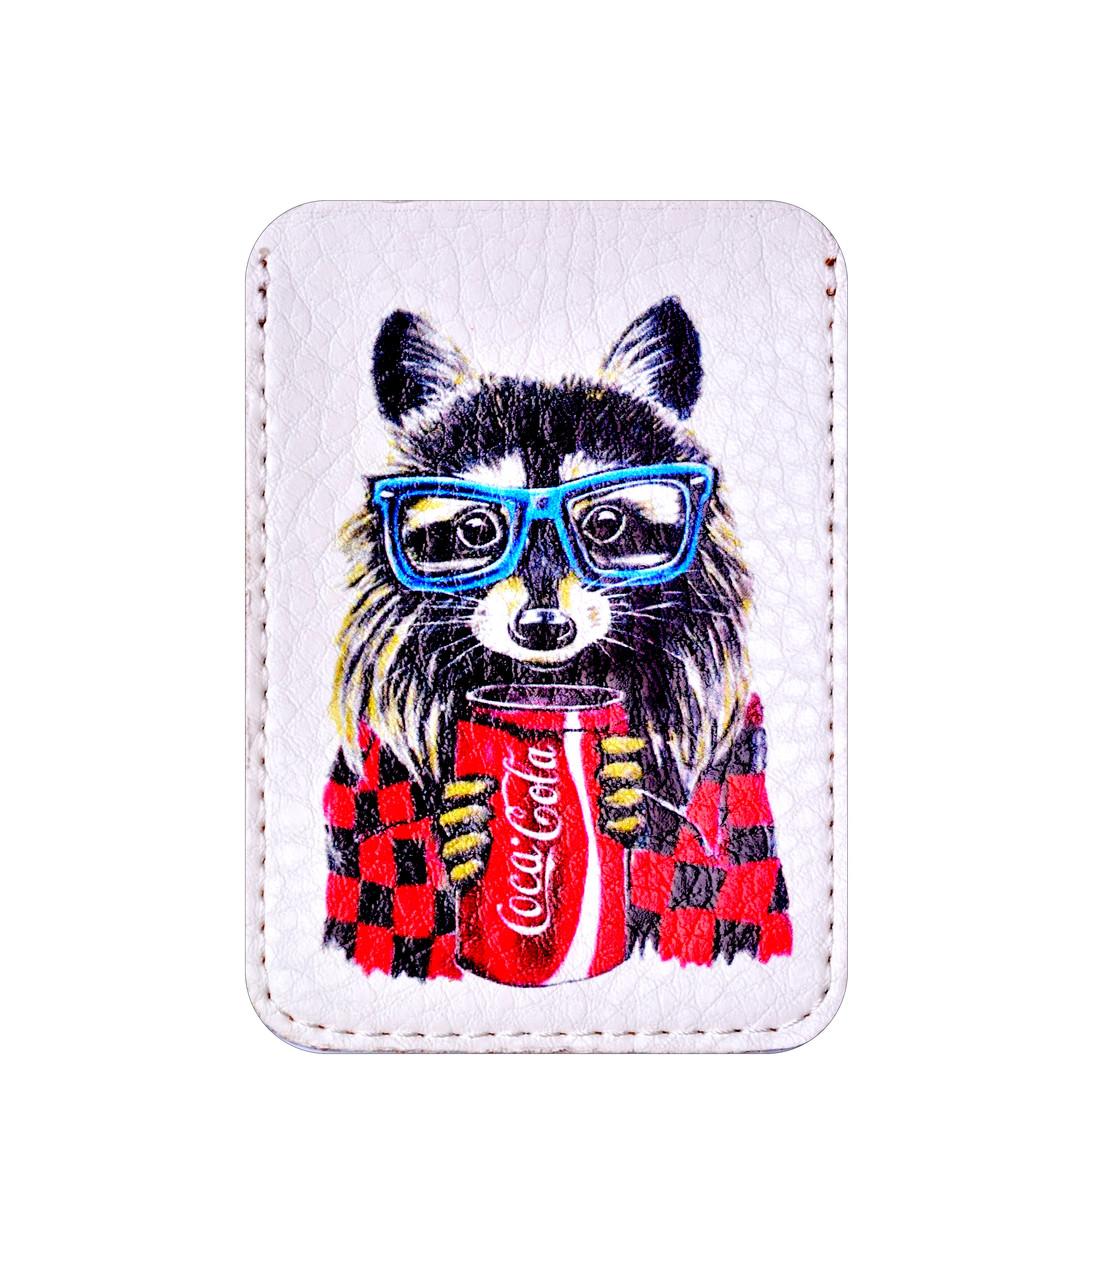 Чехол для ID карты Кока-кола